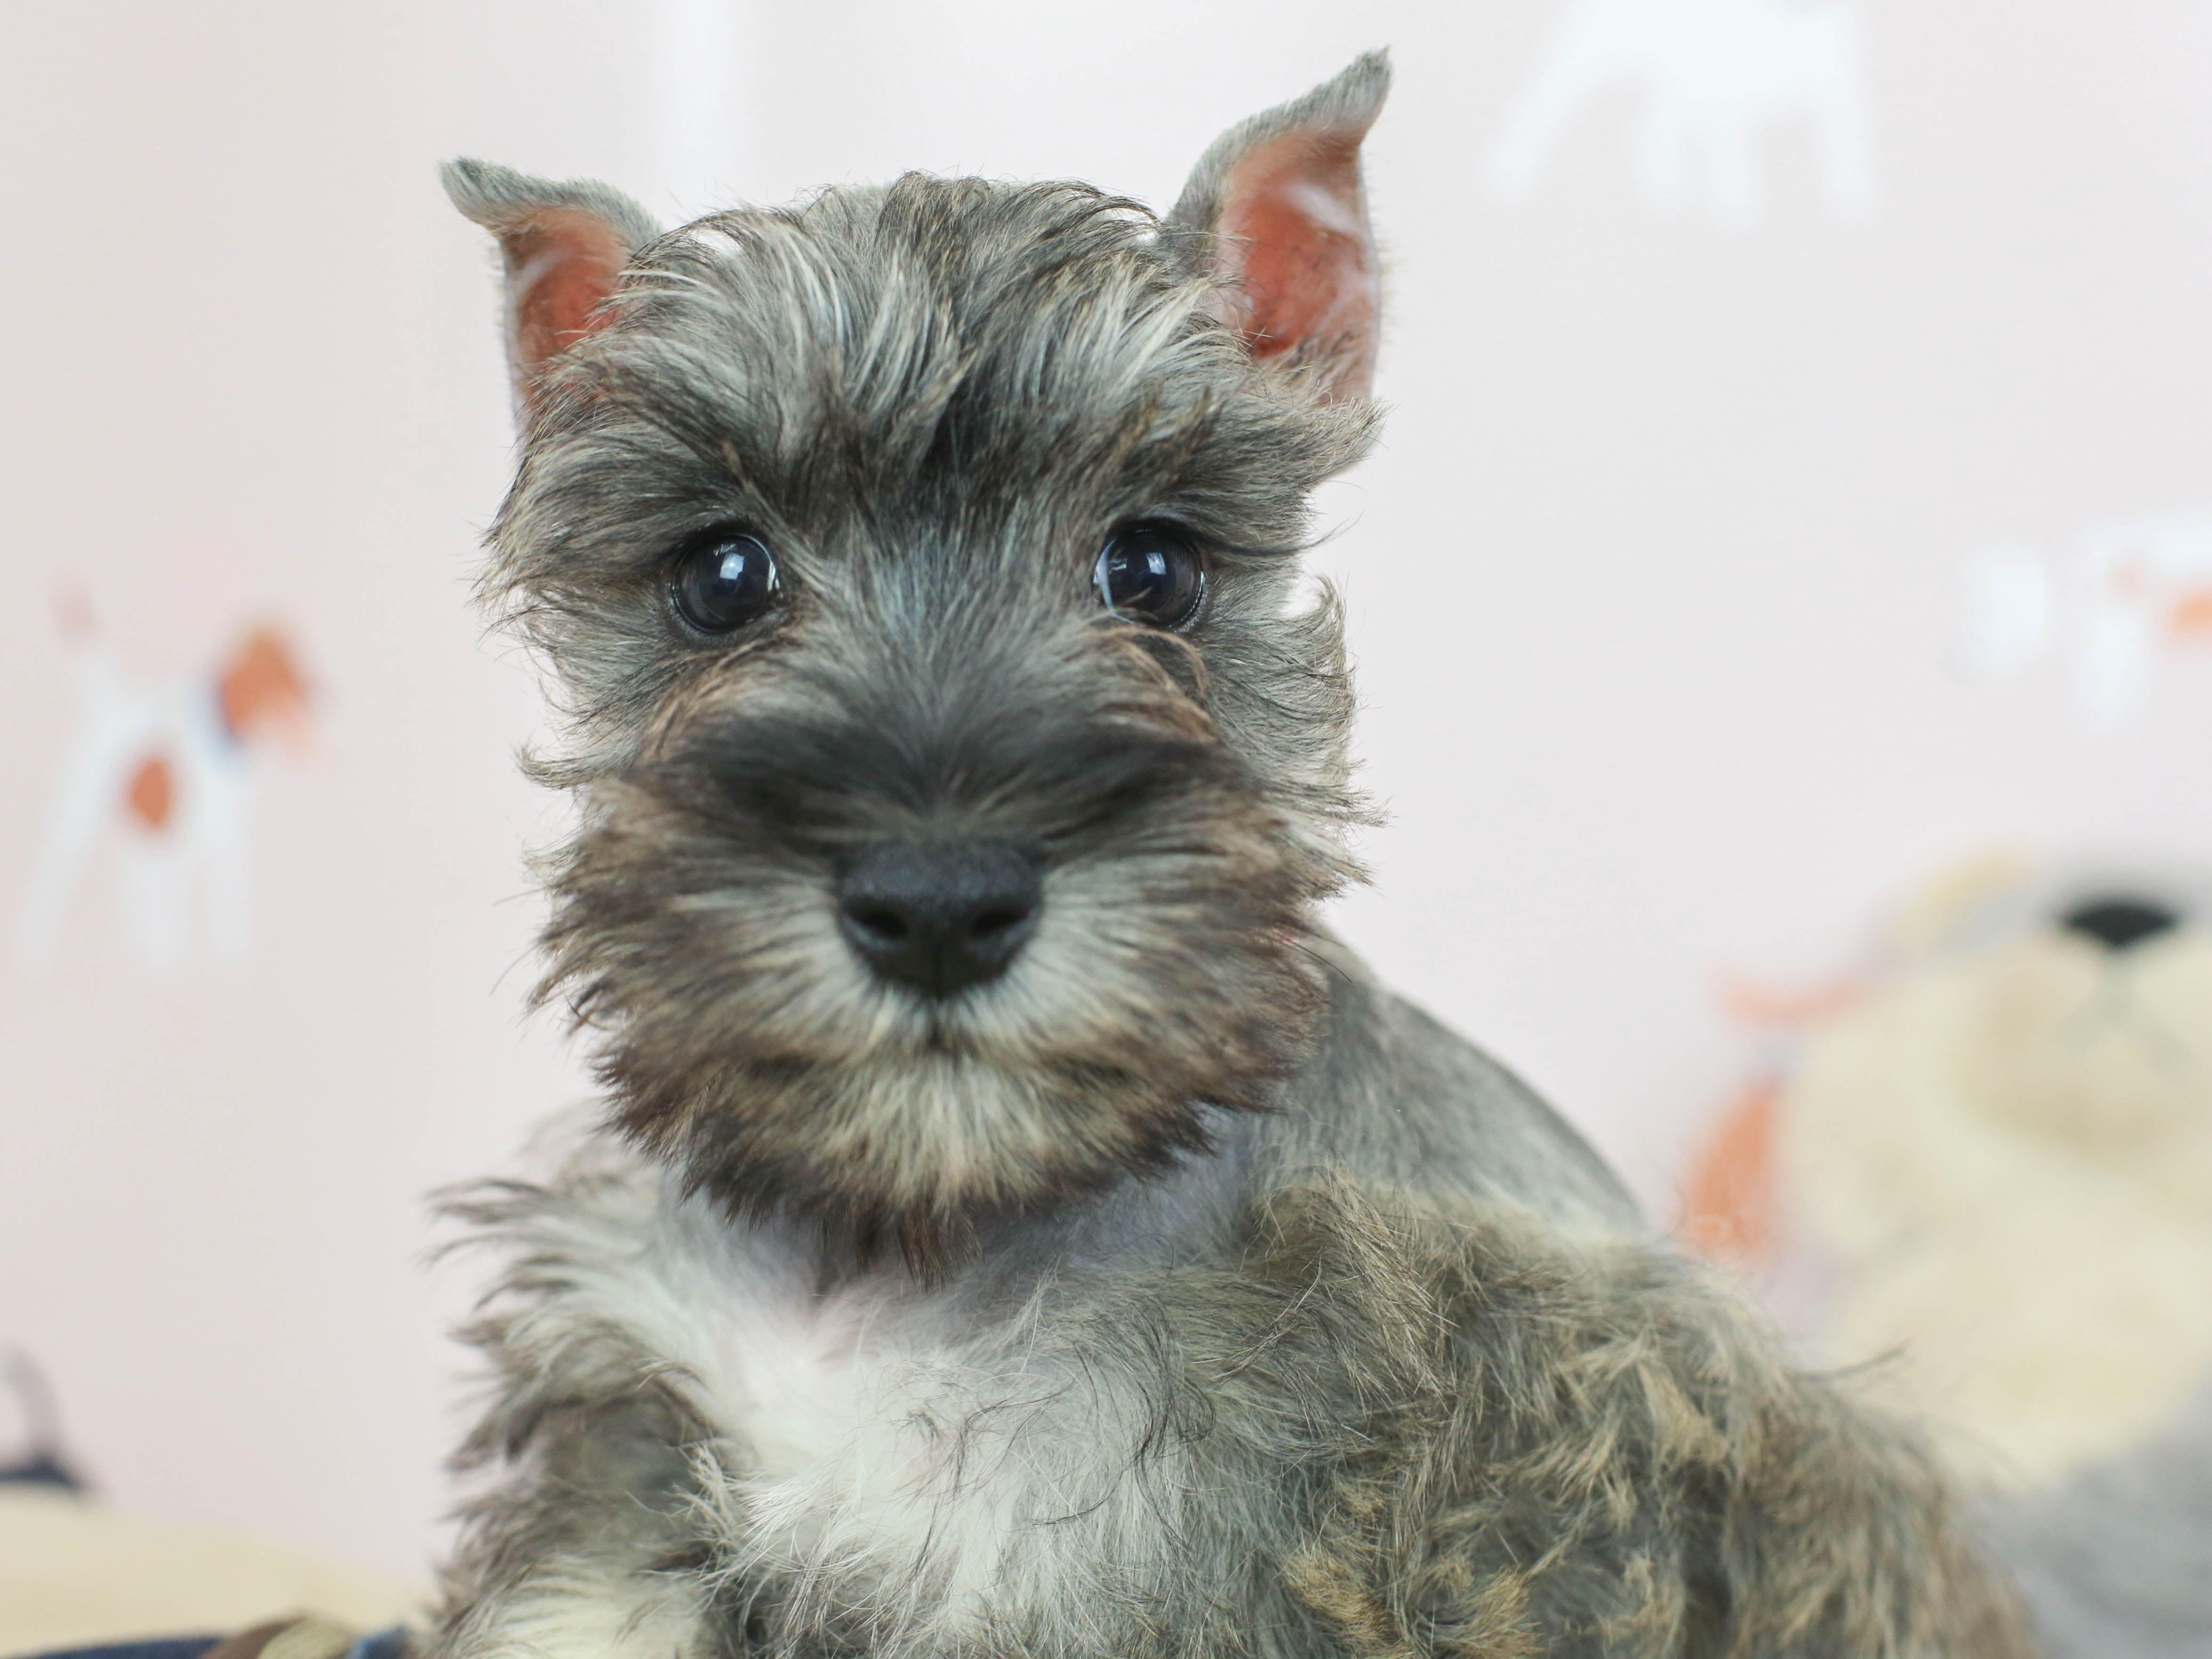 Miniature Schnauzer Breeders Schnauzer Puppies For Sale In Houston Texas With Images Schnauzer Puppy Puppies For Sale Miniature Schnauzer Puppies